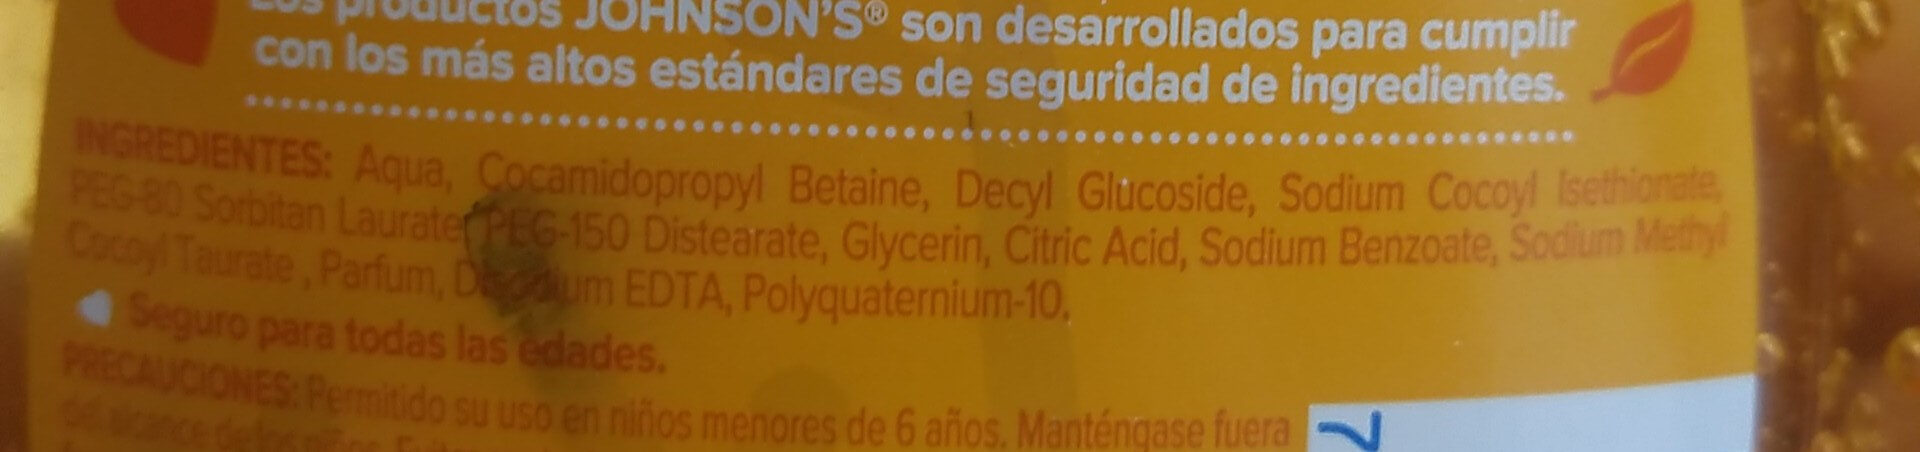 Baby Shampoo - Ingredients - es